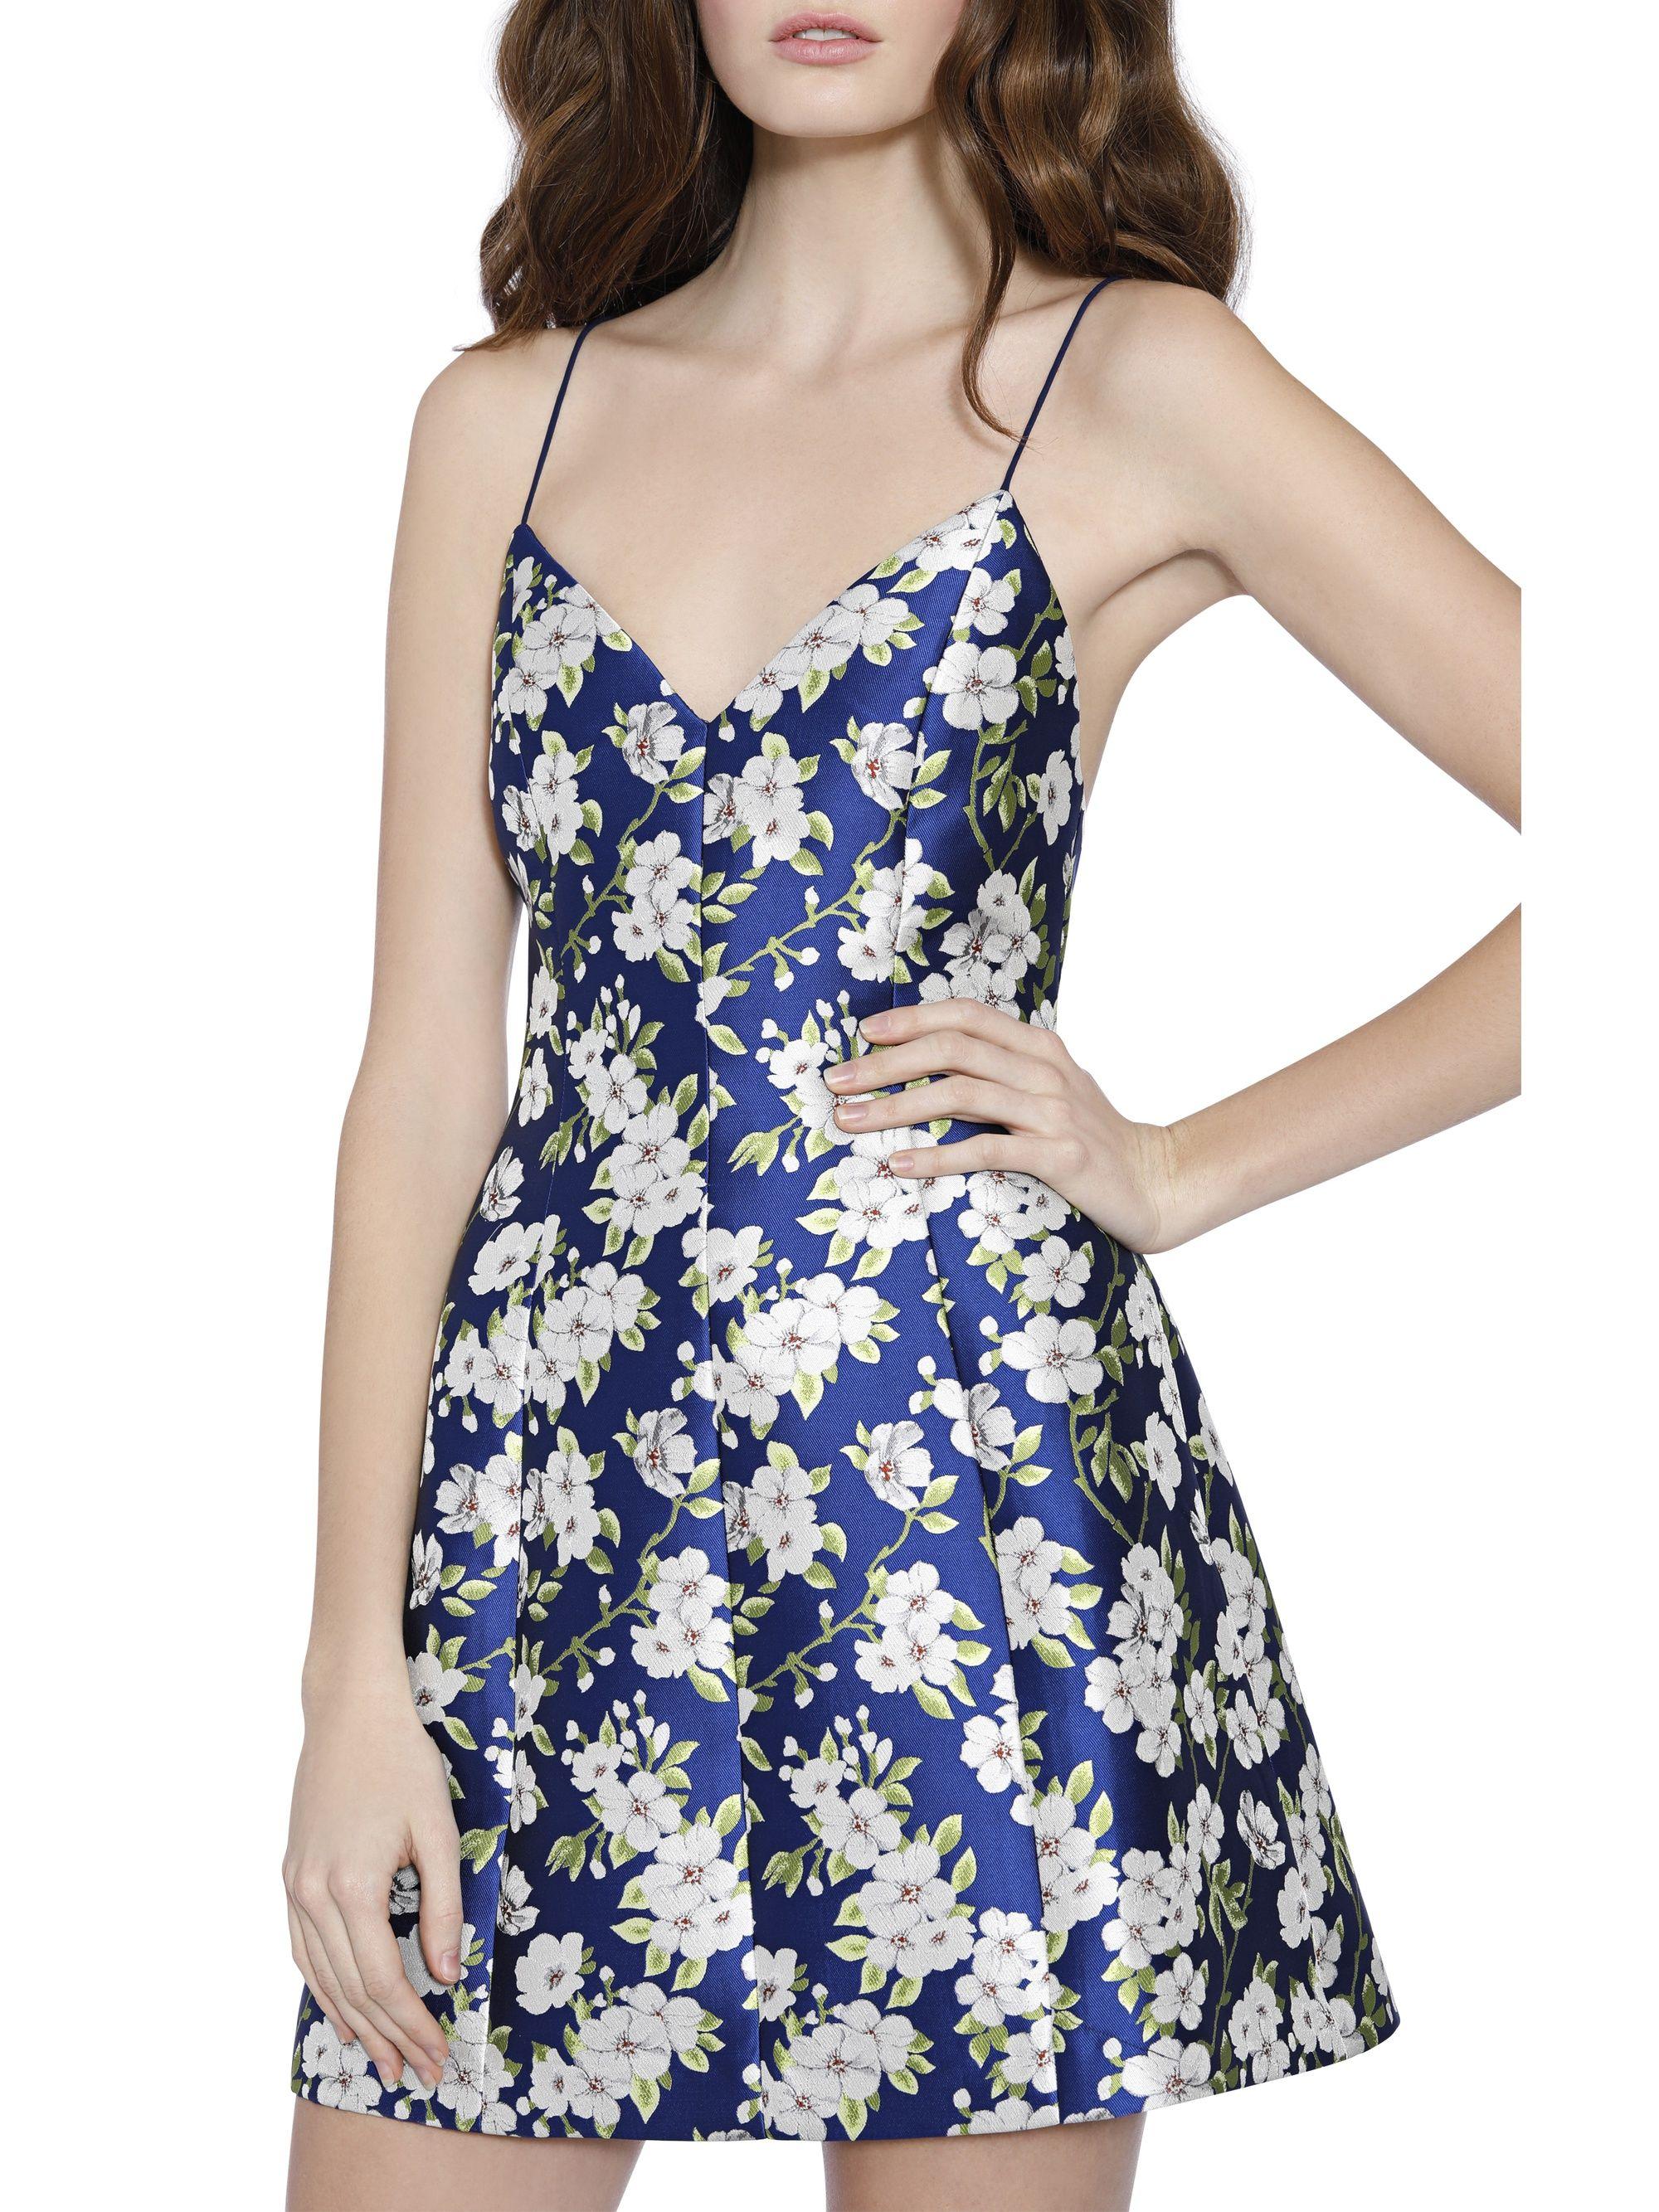 ab0f71dd8b95 TAYLA STRUCTURED LANTERN MINI DRESS by Alice + Olivia | Spring ...